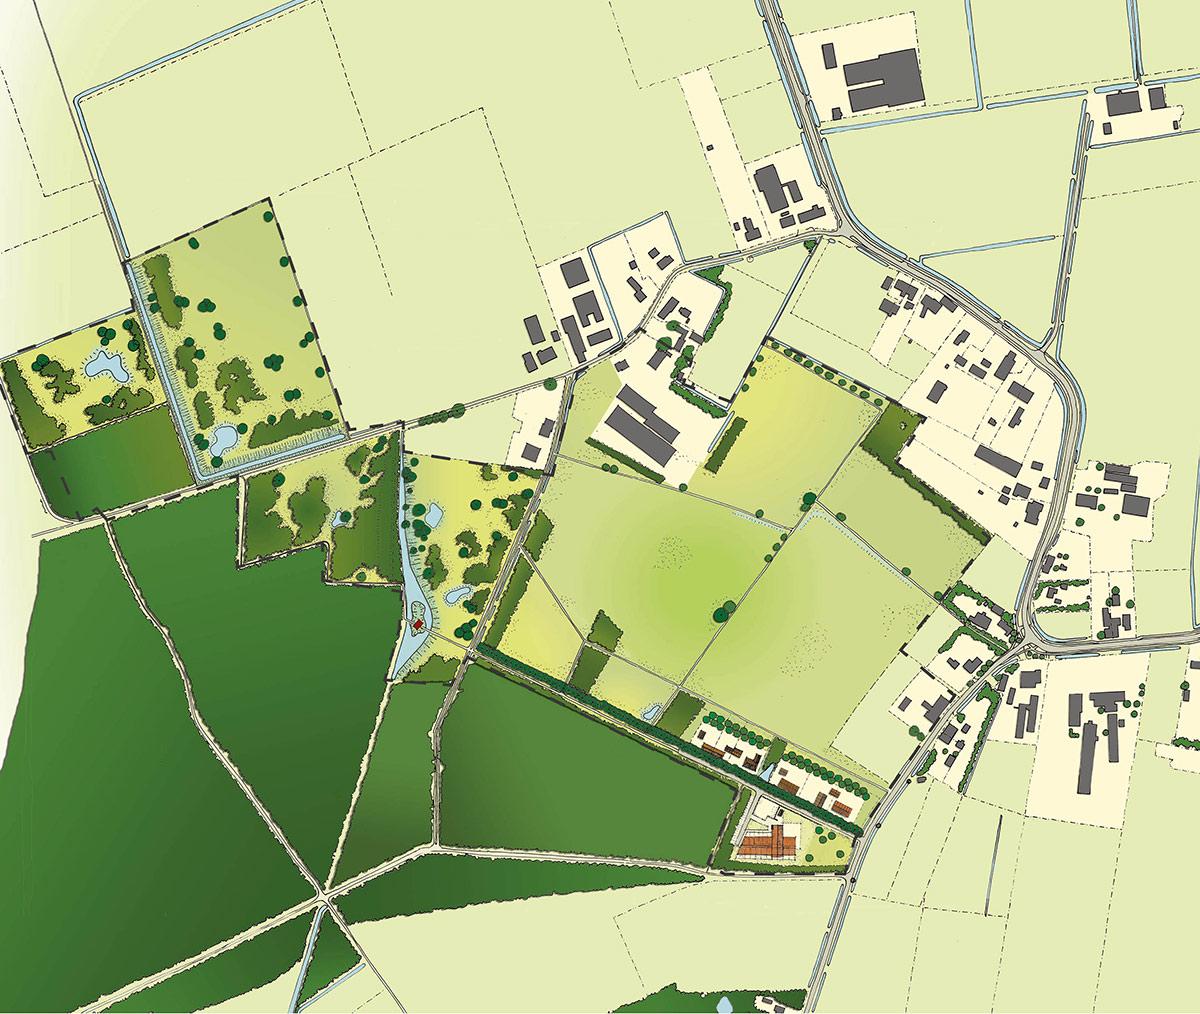 SAB Nieuw landgoed Nabbegat masterplan